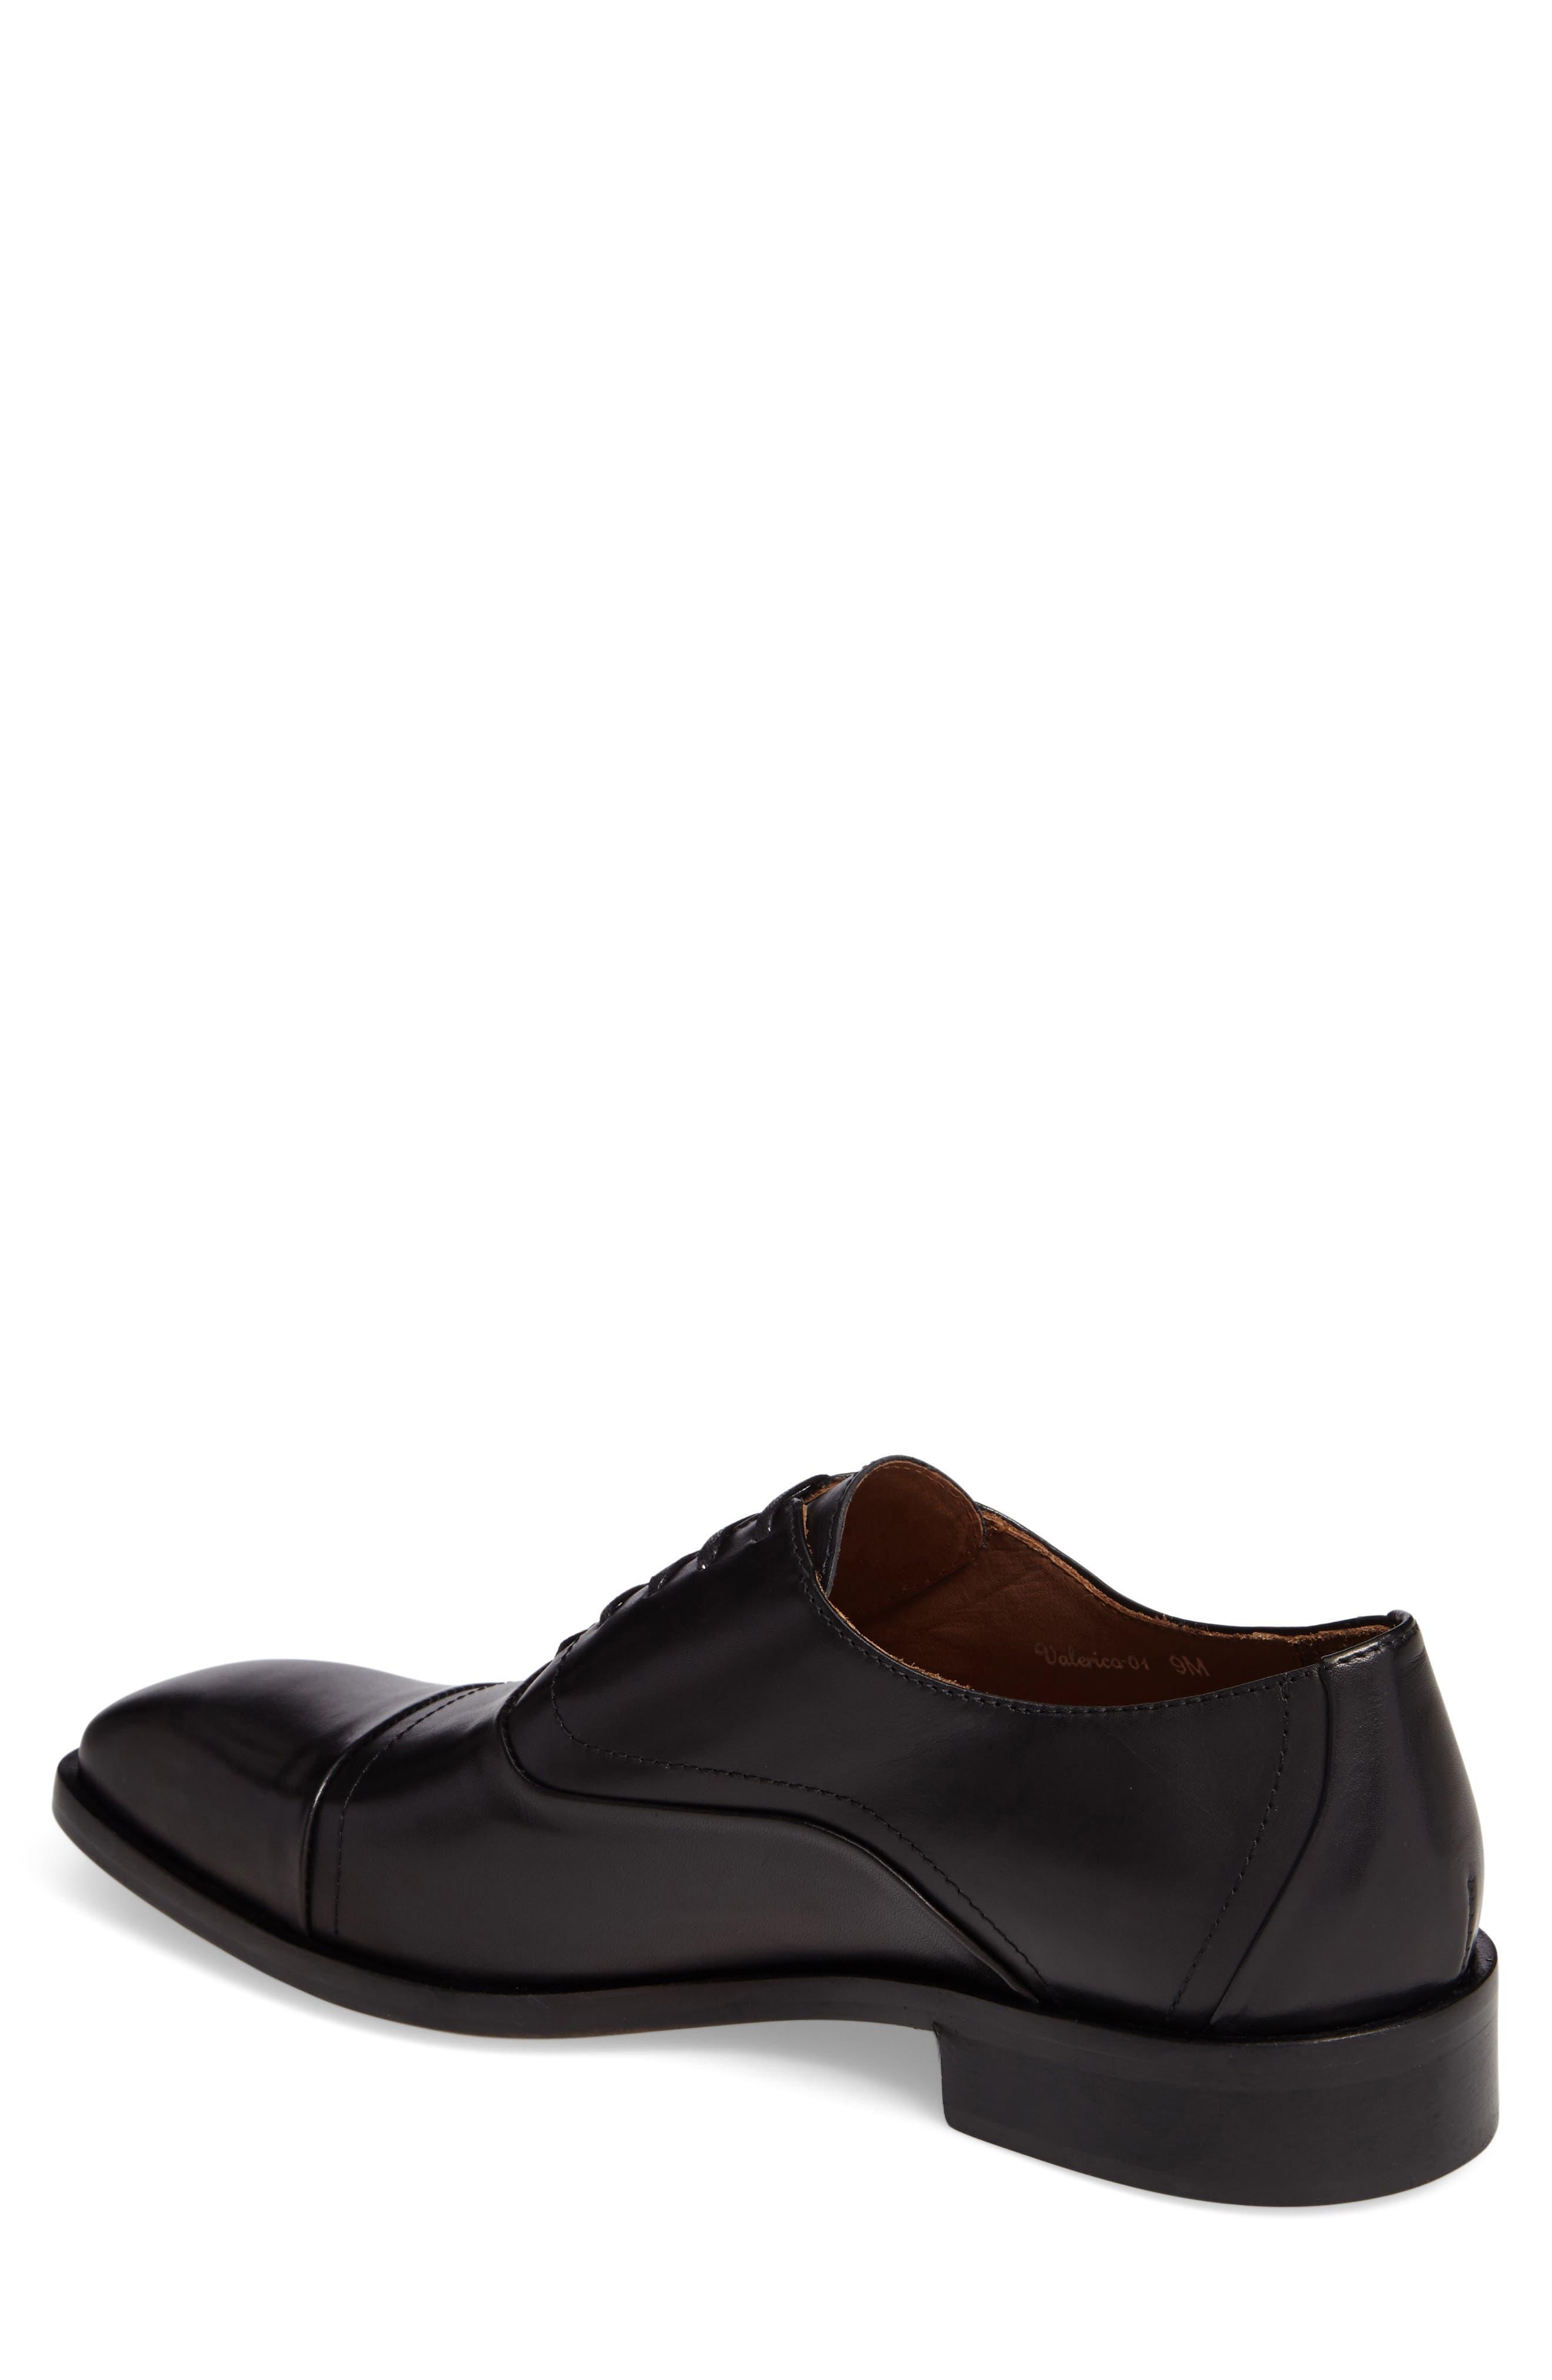 Valerico Cap Toe Oxford,                             Alternate thumbnail 2, color,                             Black Leather